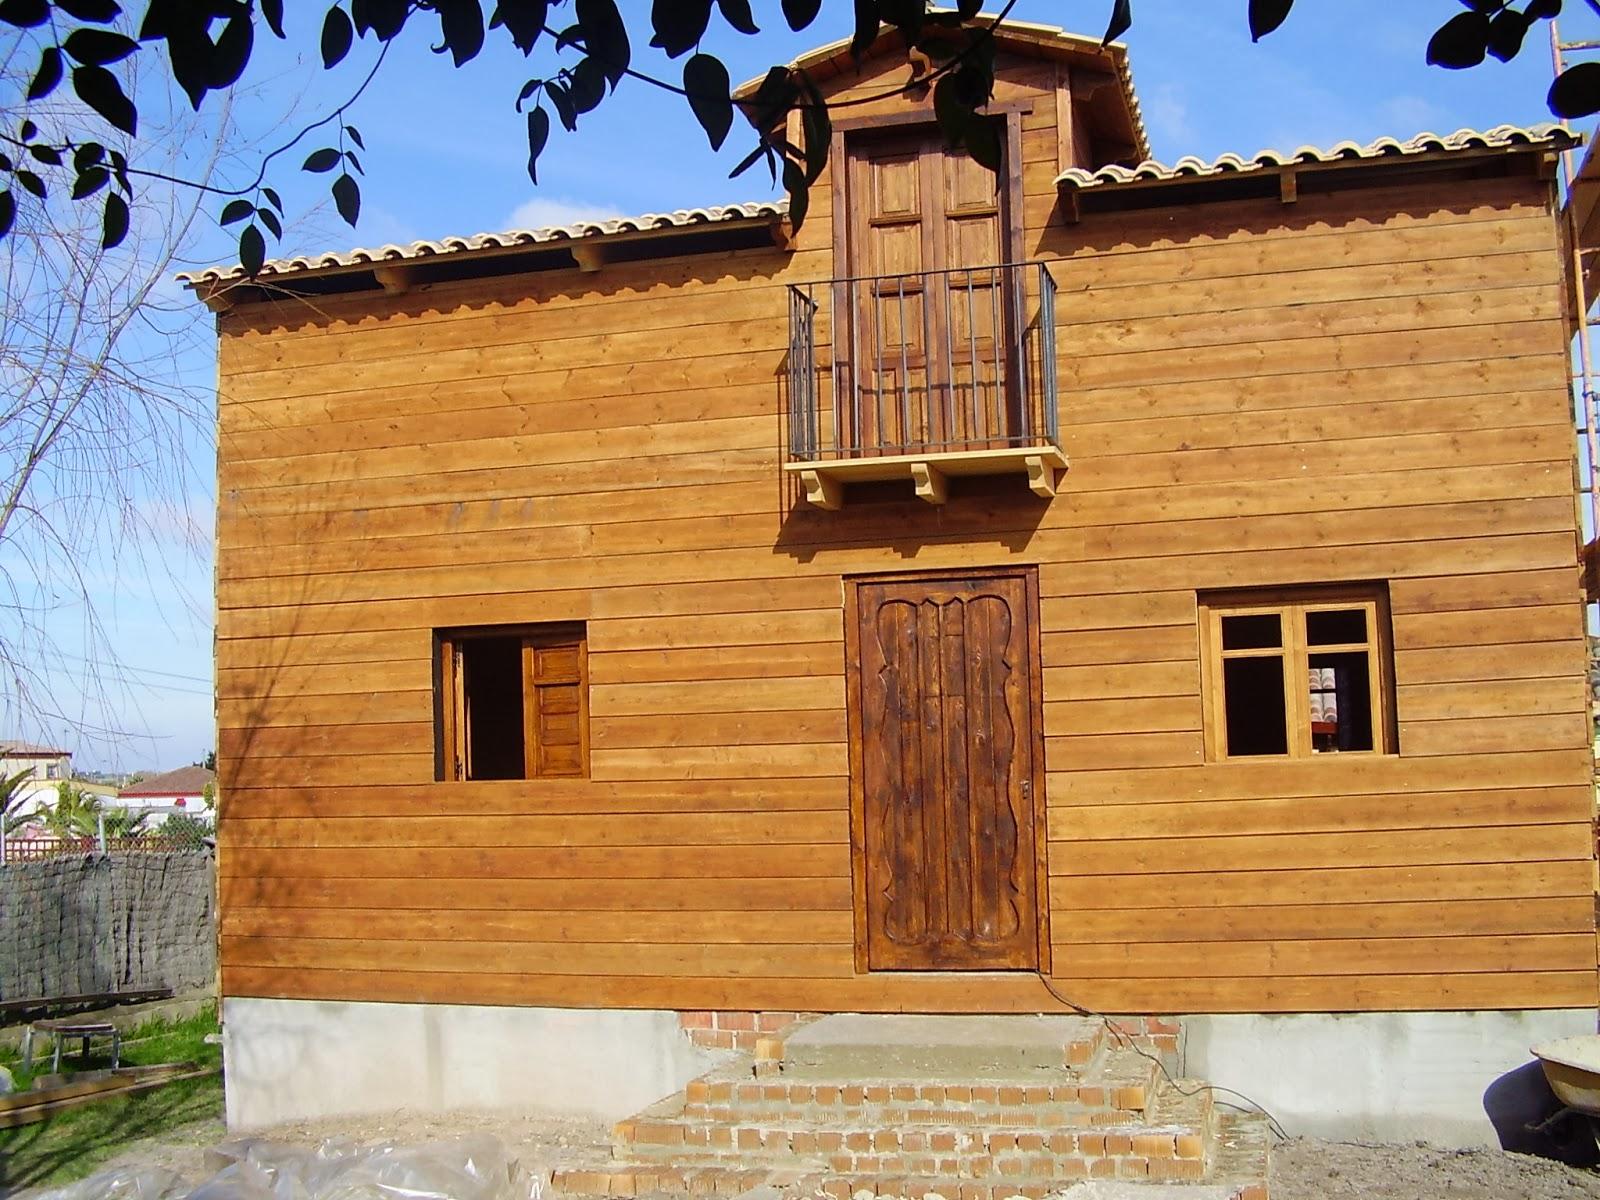 Madera artesana productos elaborados artesanalmente - Casas de madera maciza ...